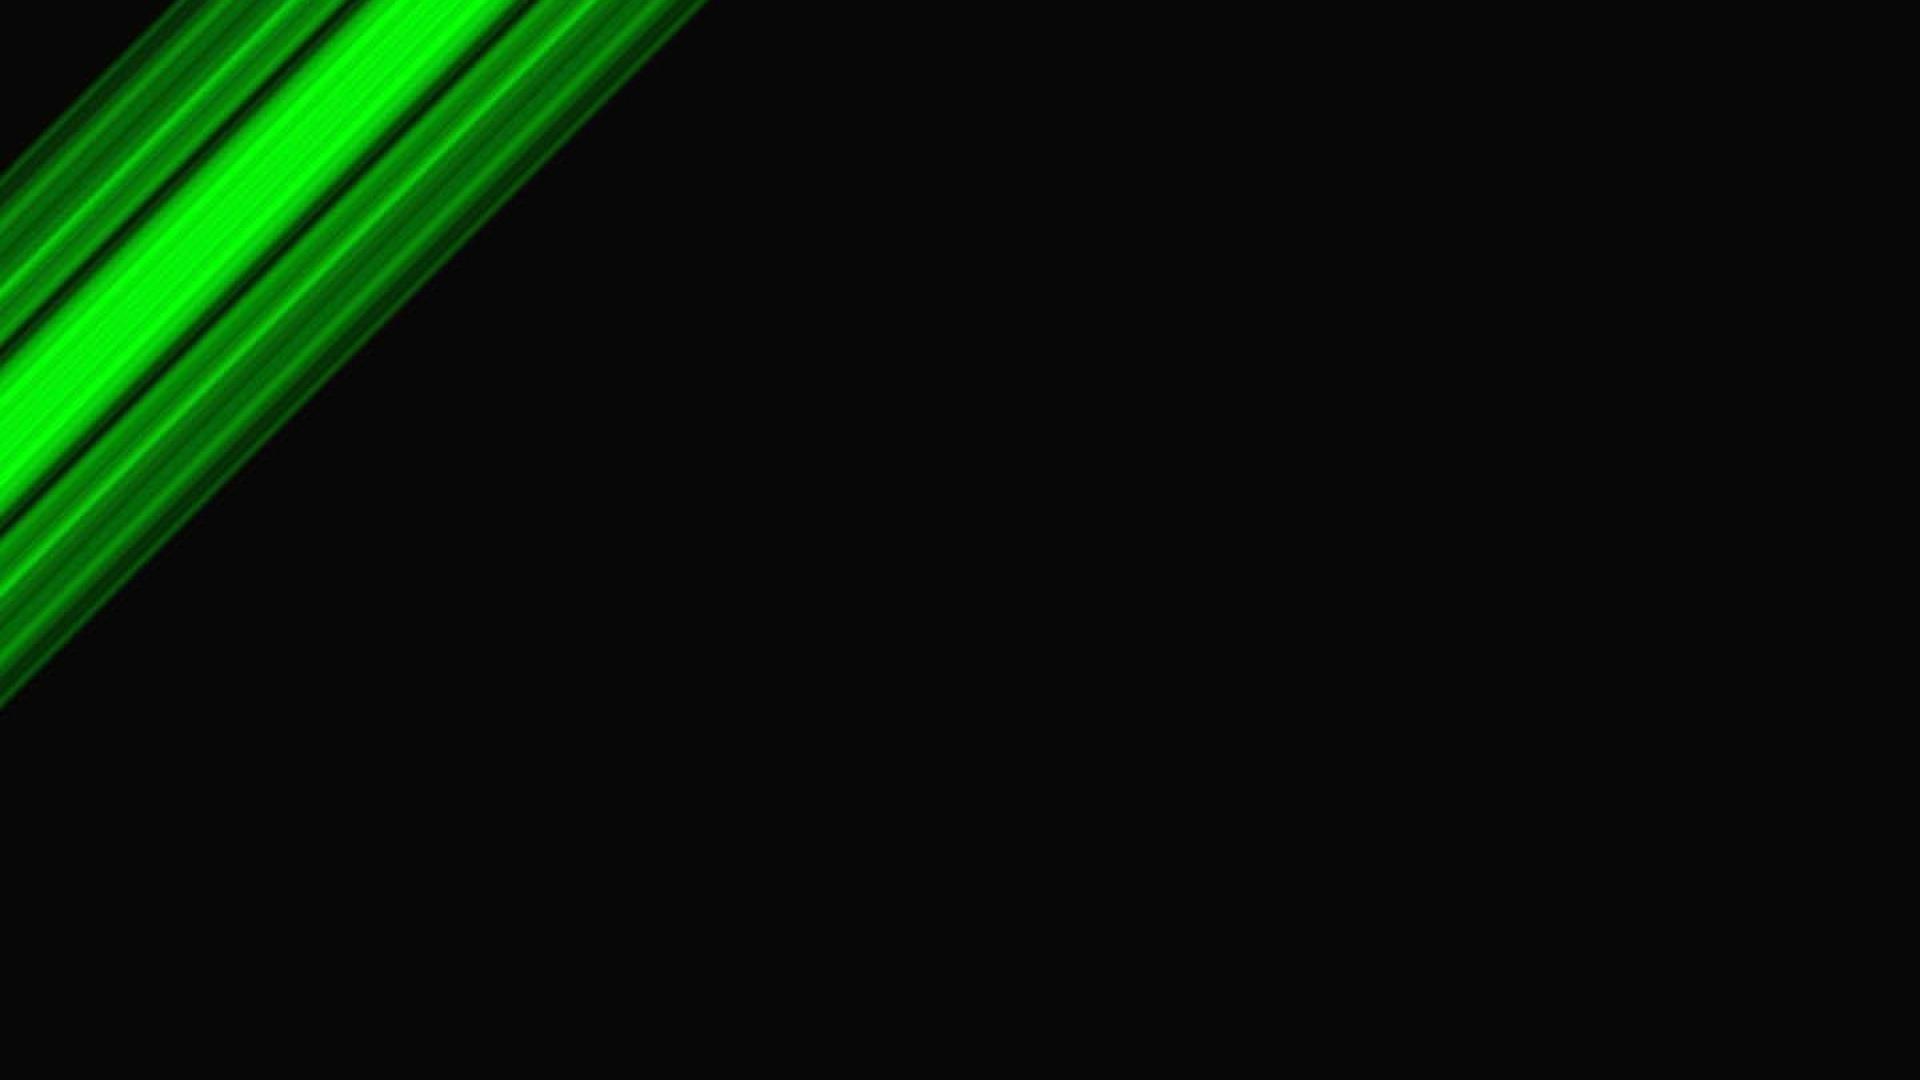 Black And Green Wallpaper image hd